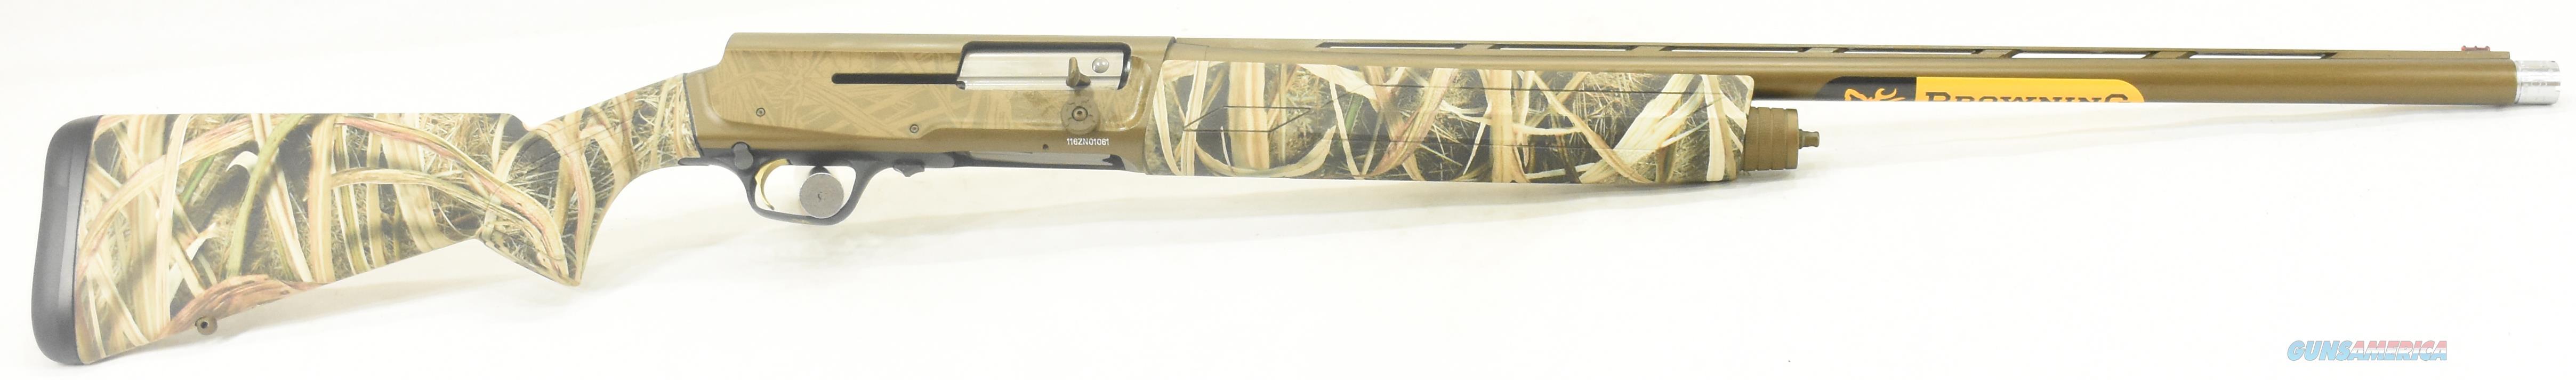 0118413005 Browning A5 Wicked Wing Blades Camo 12 Ga 26-3In  Guns > Shotguns > Browning Shotguns > Autoloaders > Hunting